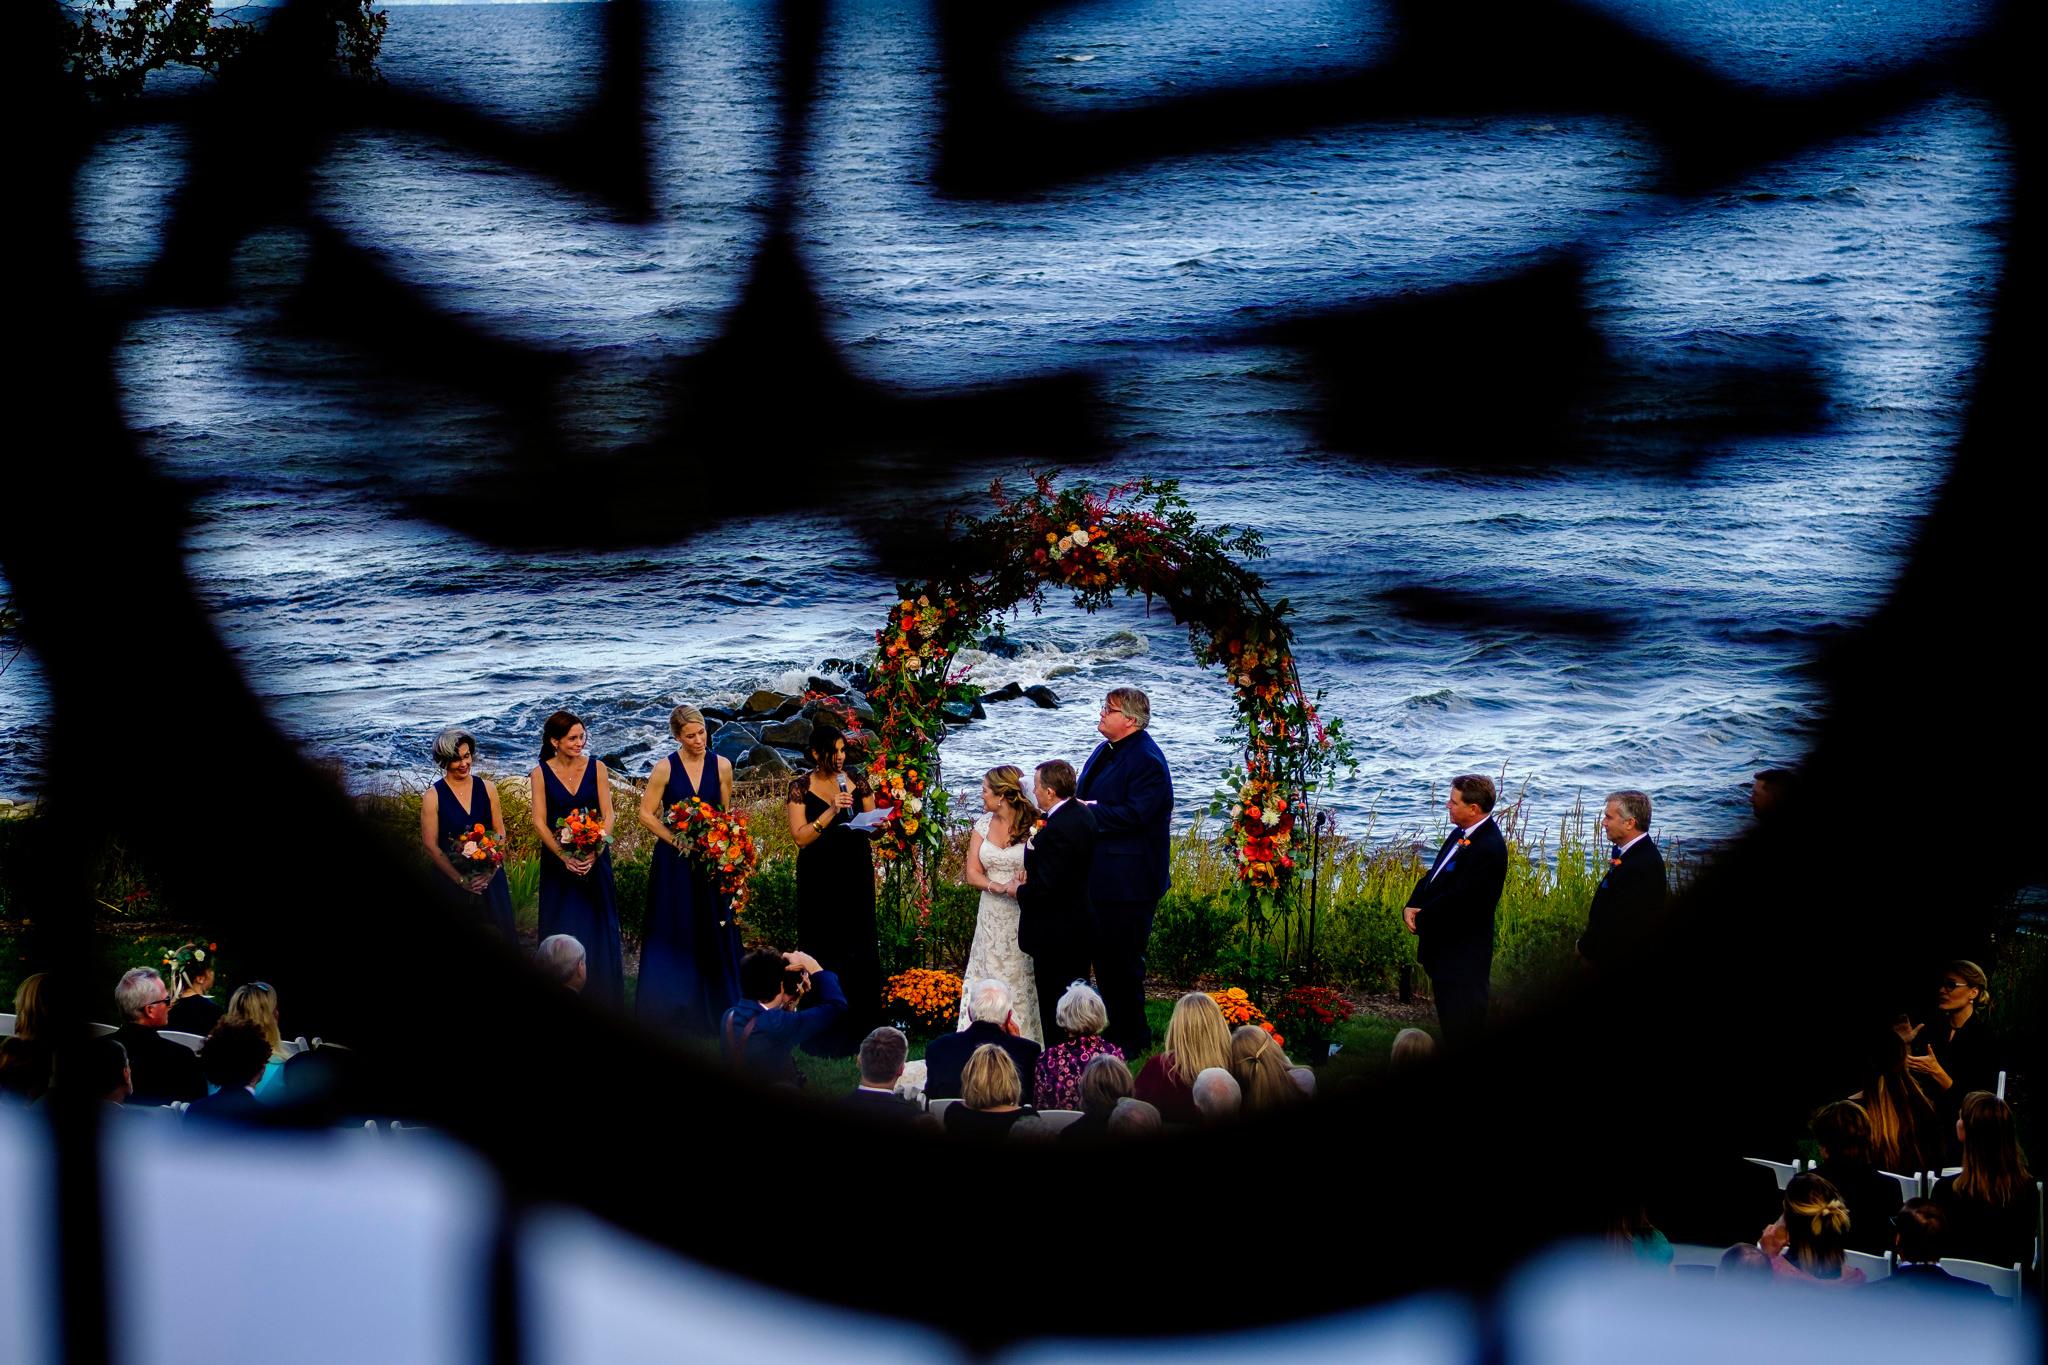 16-whitney-tad-gibson-island-club-wedding